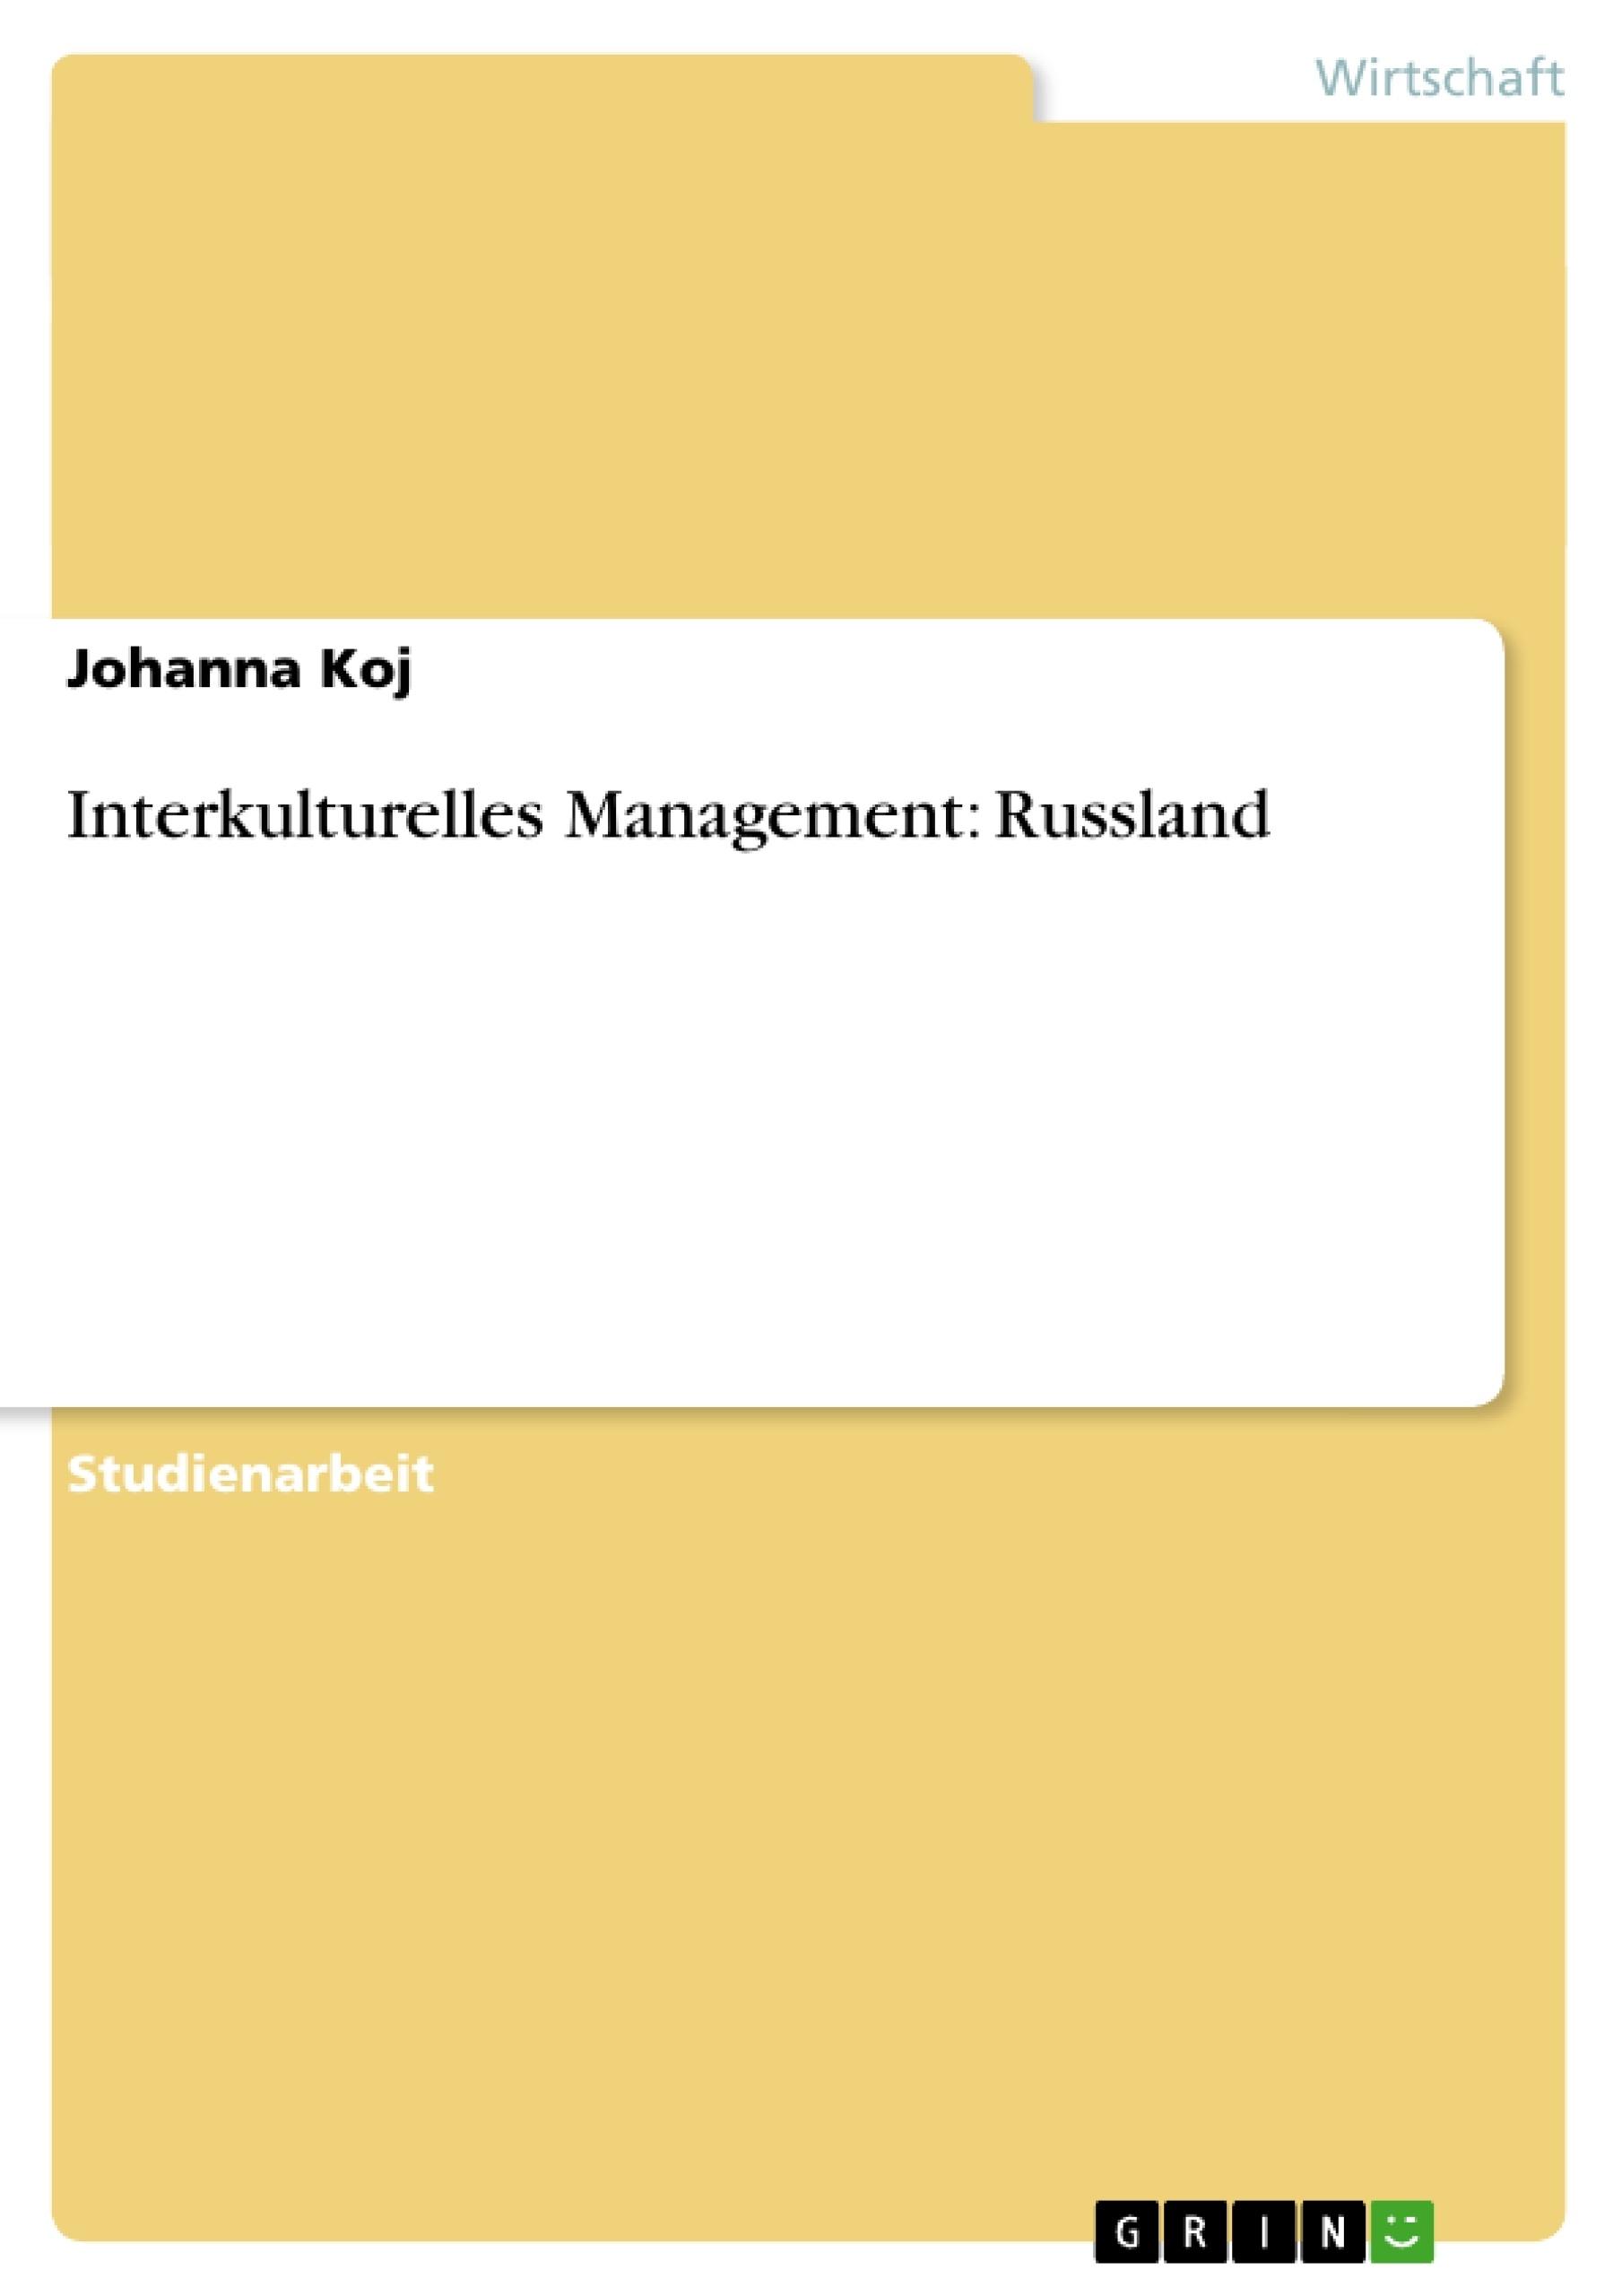 Titel: Interkulturelles Management: Russland